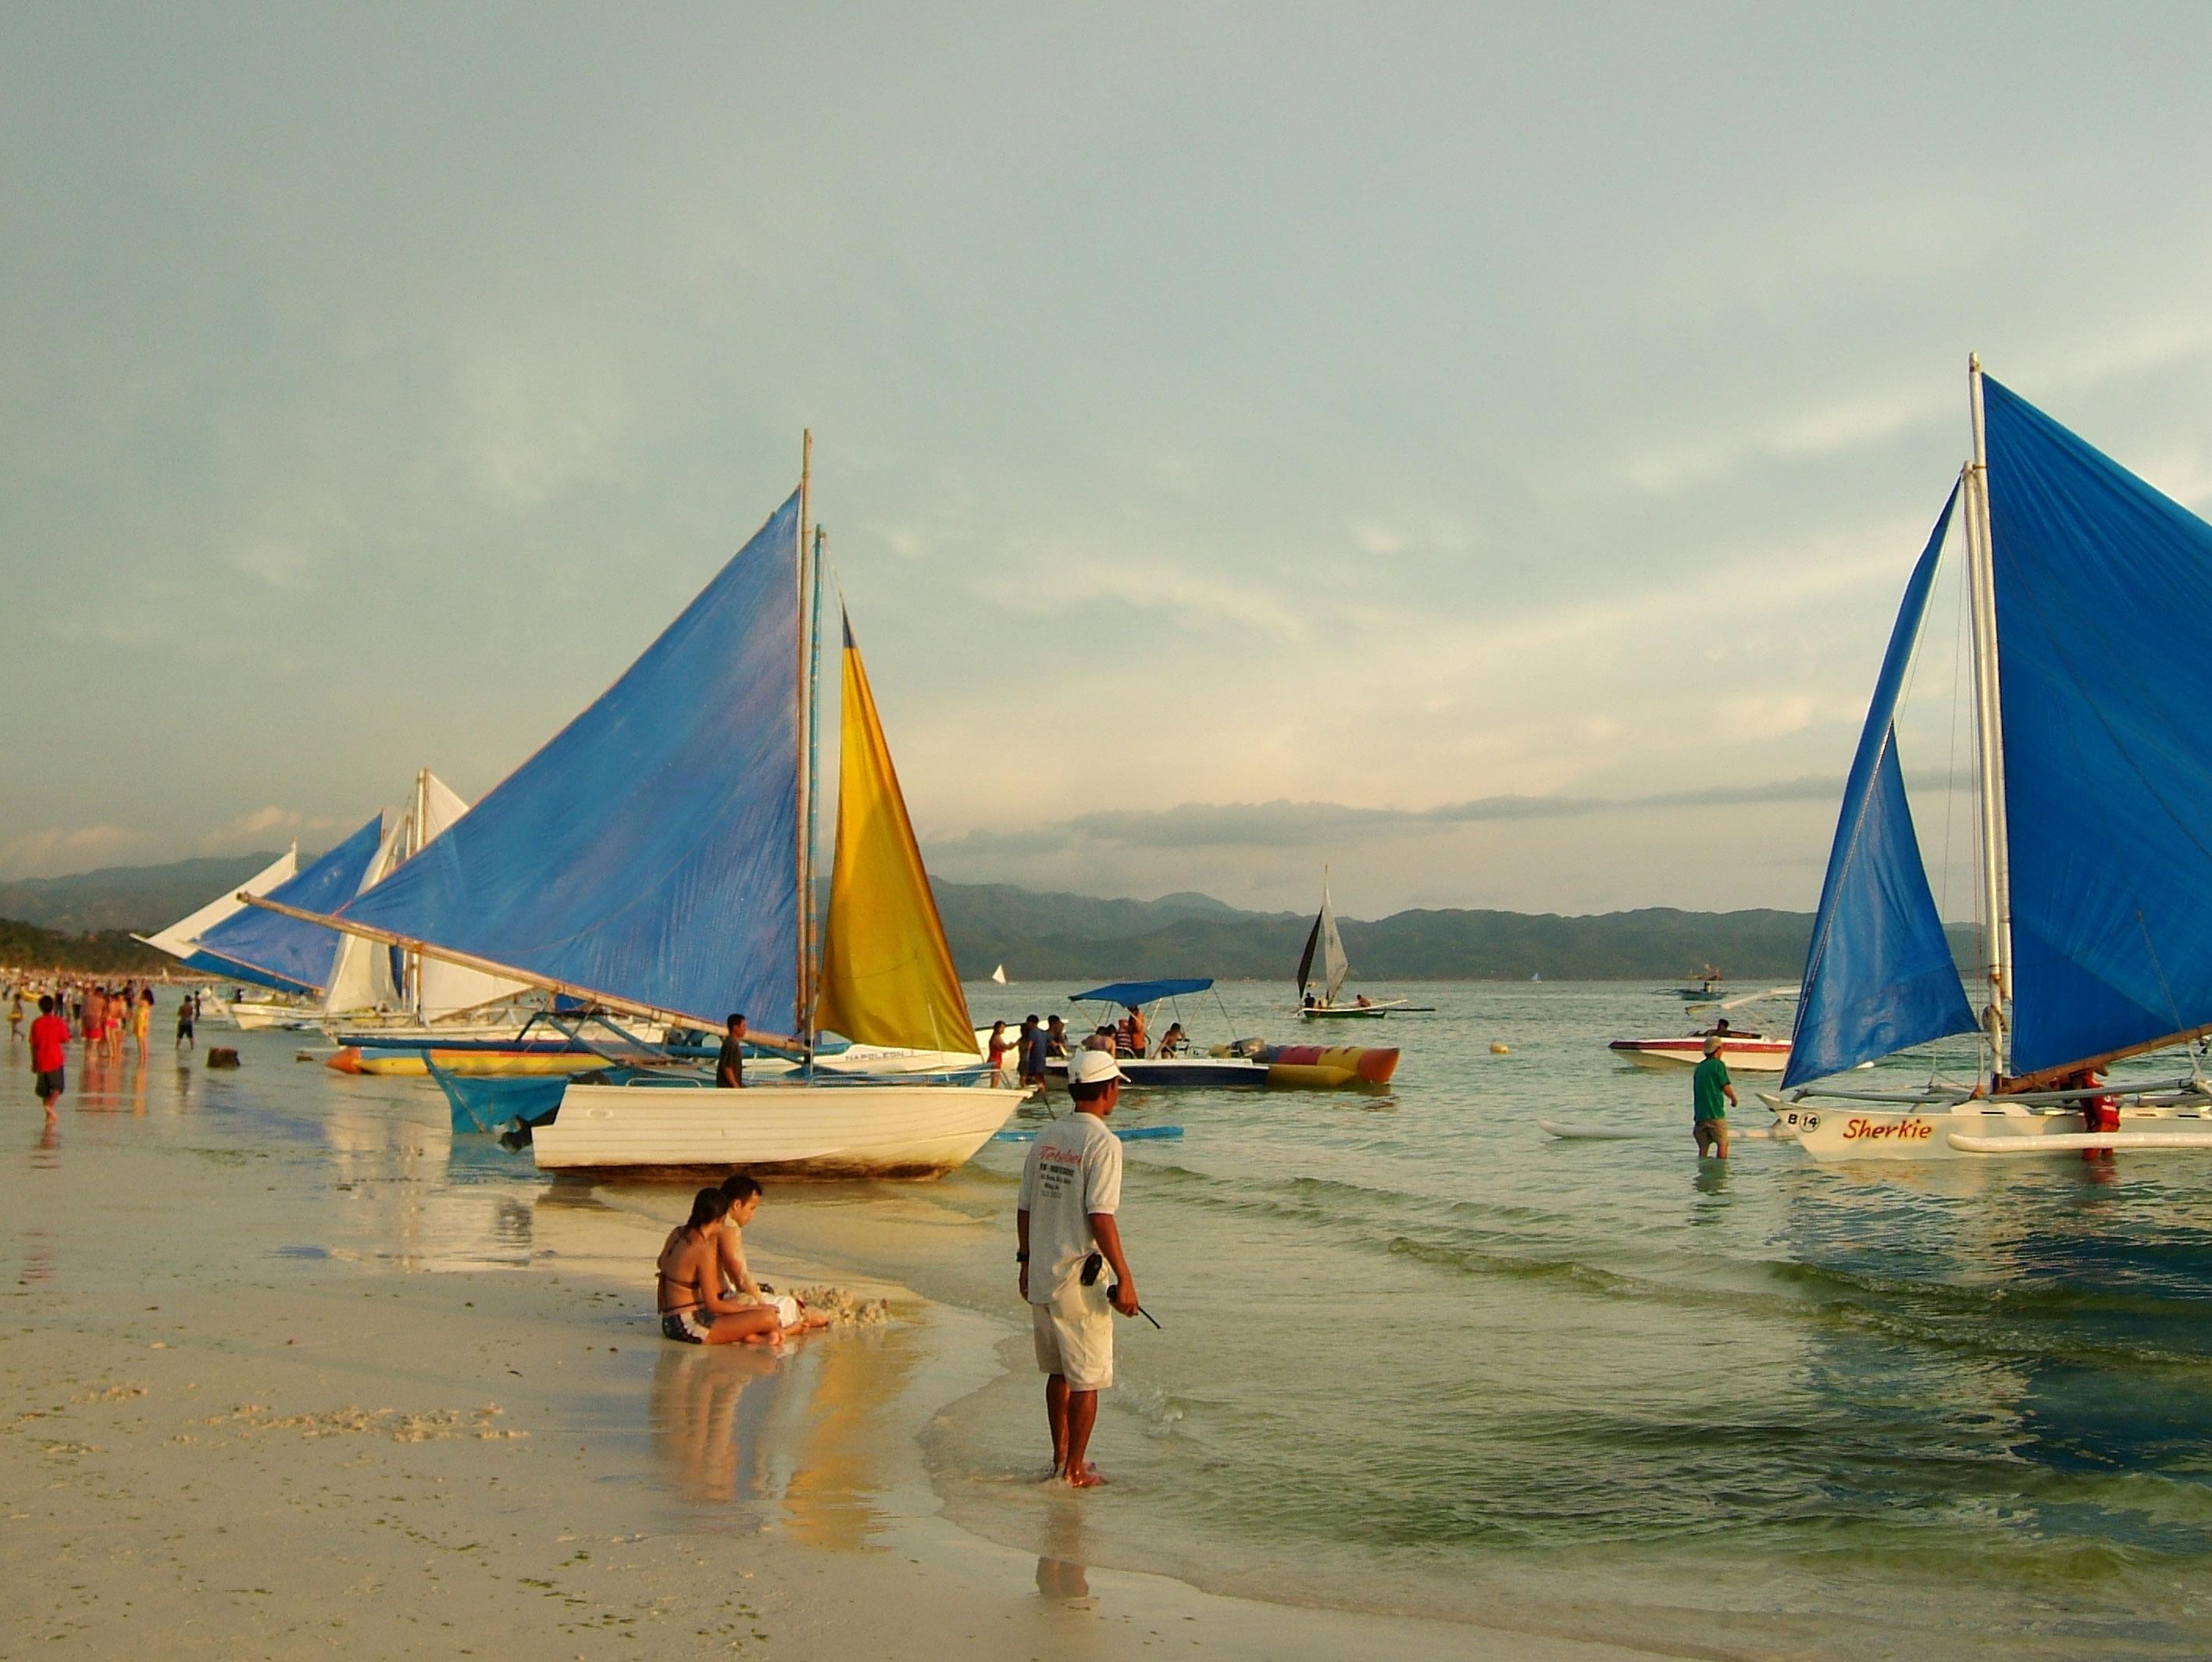 Philippines Sugar Islands Caticlan Boracay White Beach Sunset 2007 11